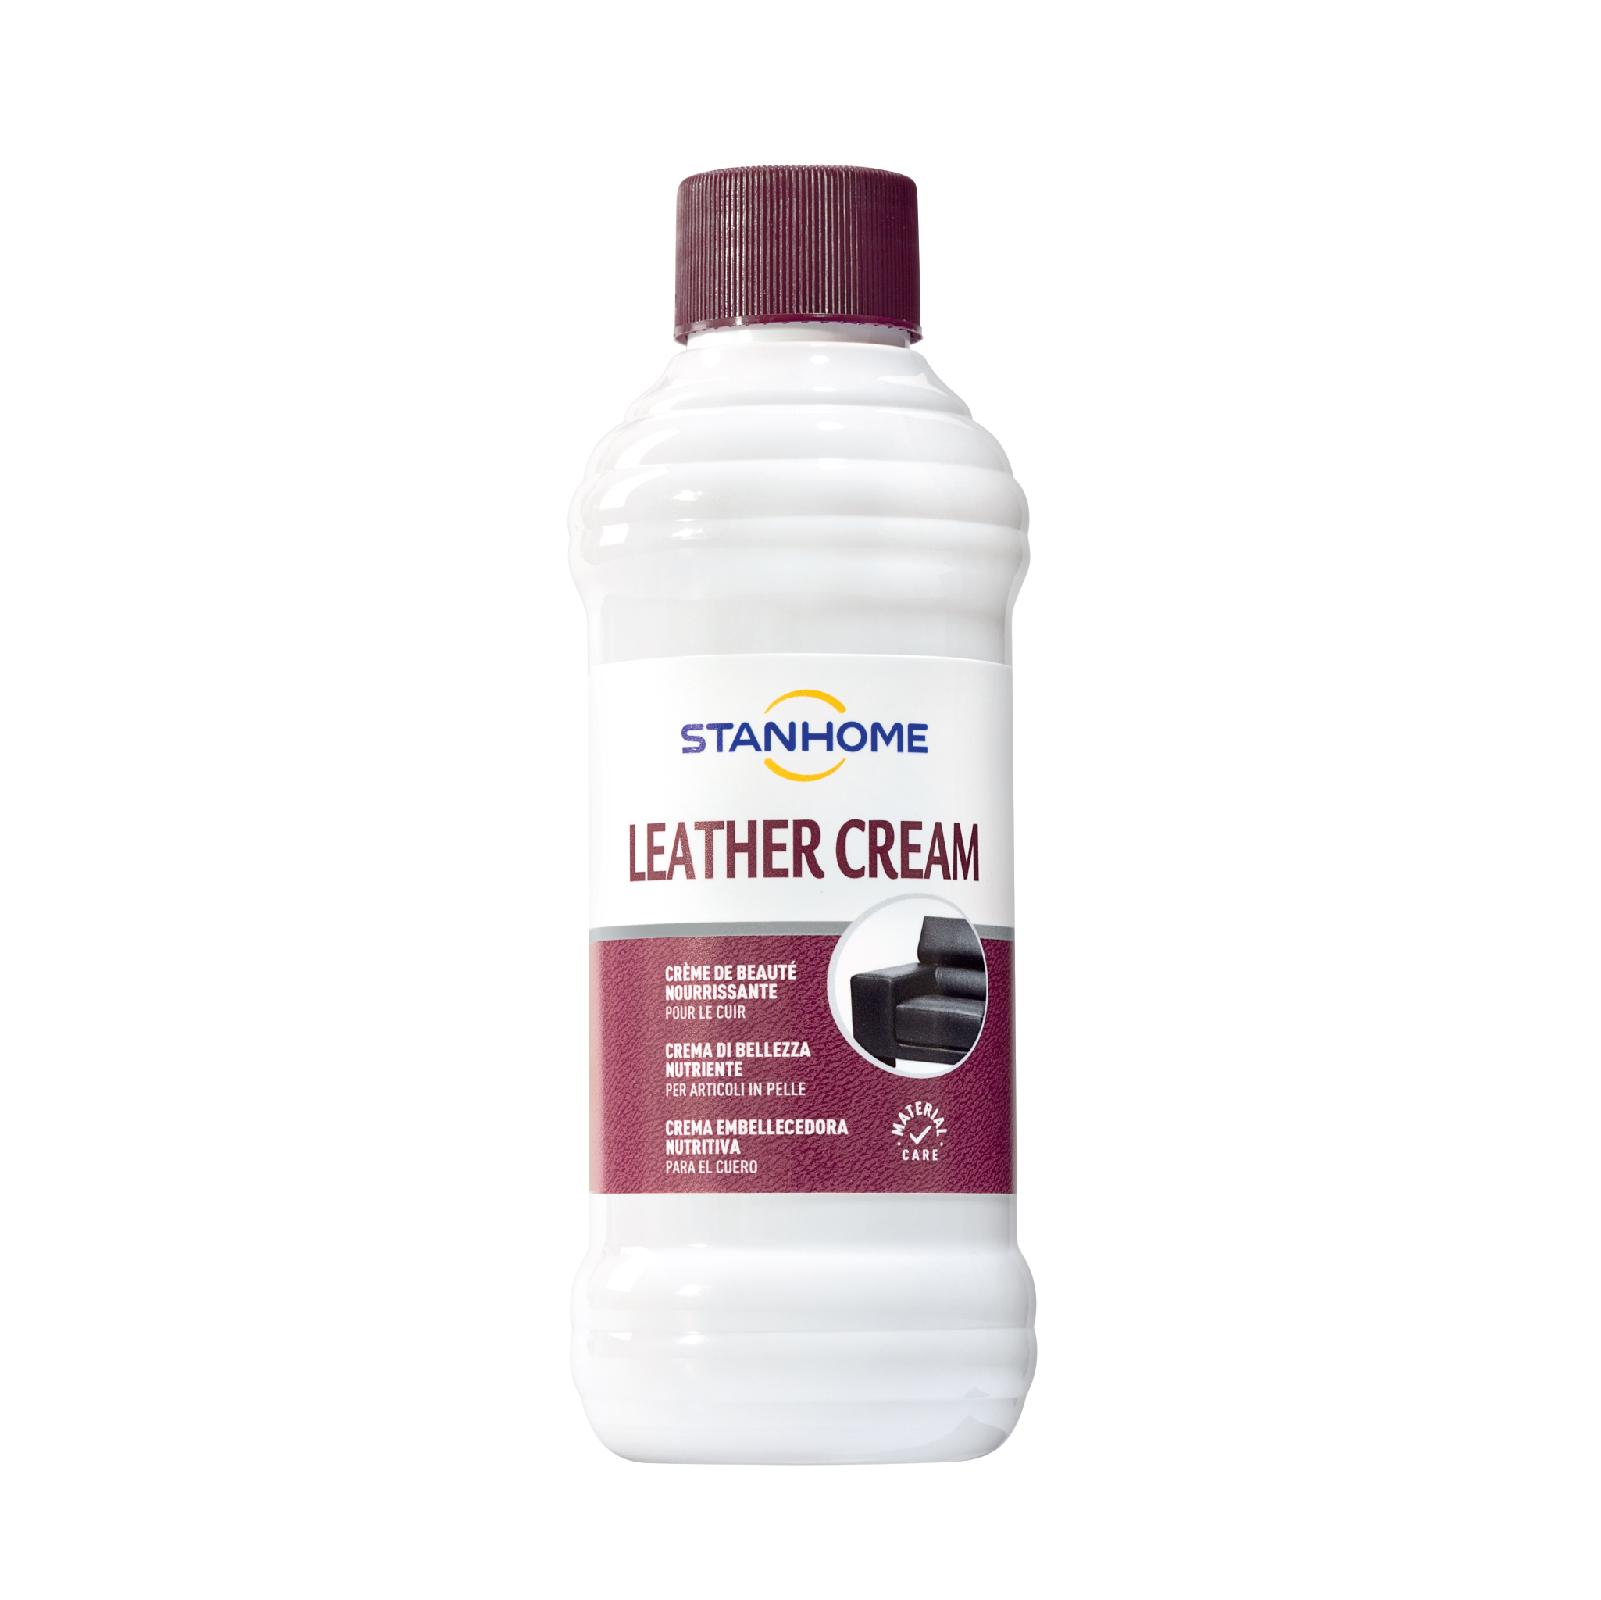 kem-duong-lam-sach-do-da-that-stanhome-leather-cream-250ml